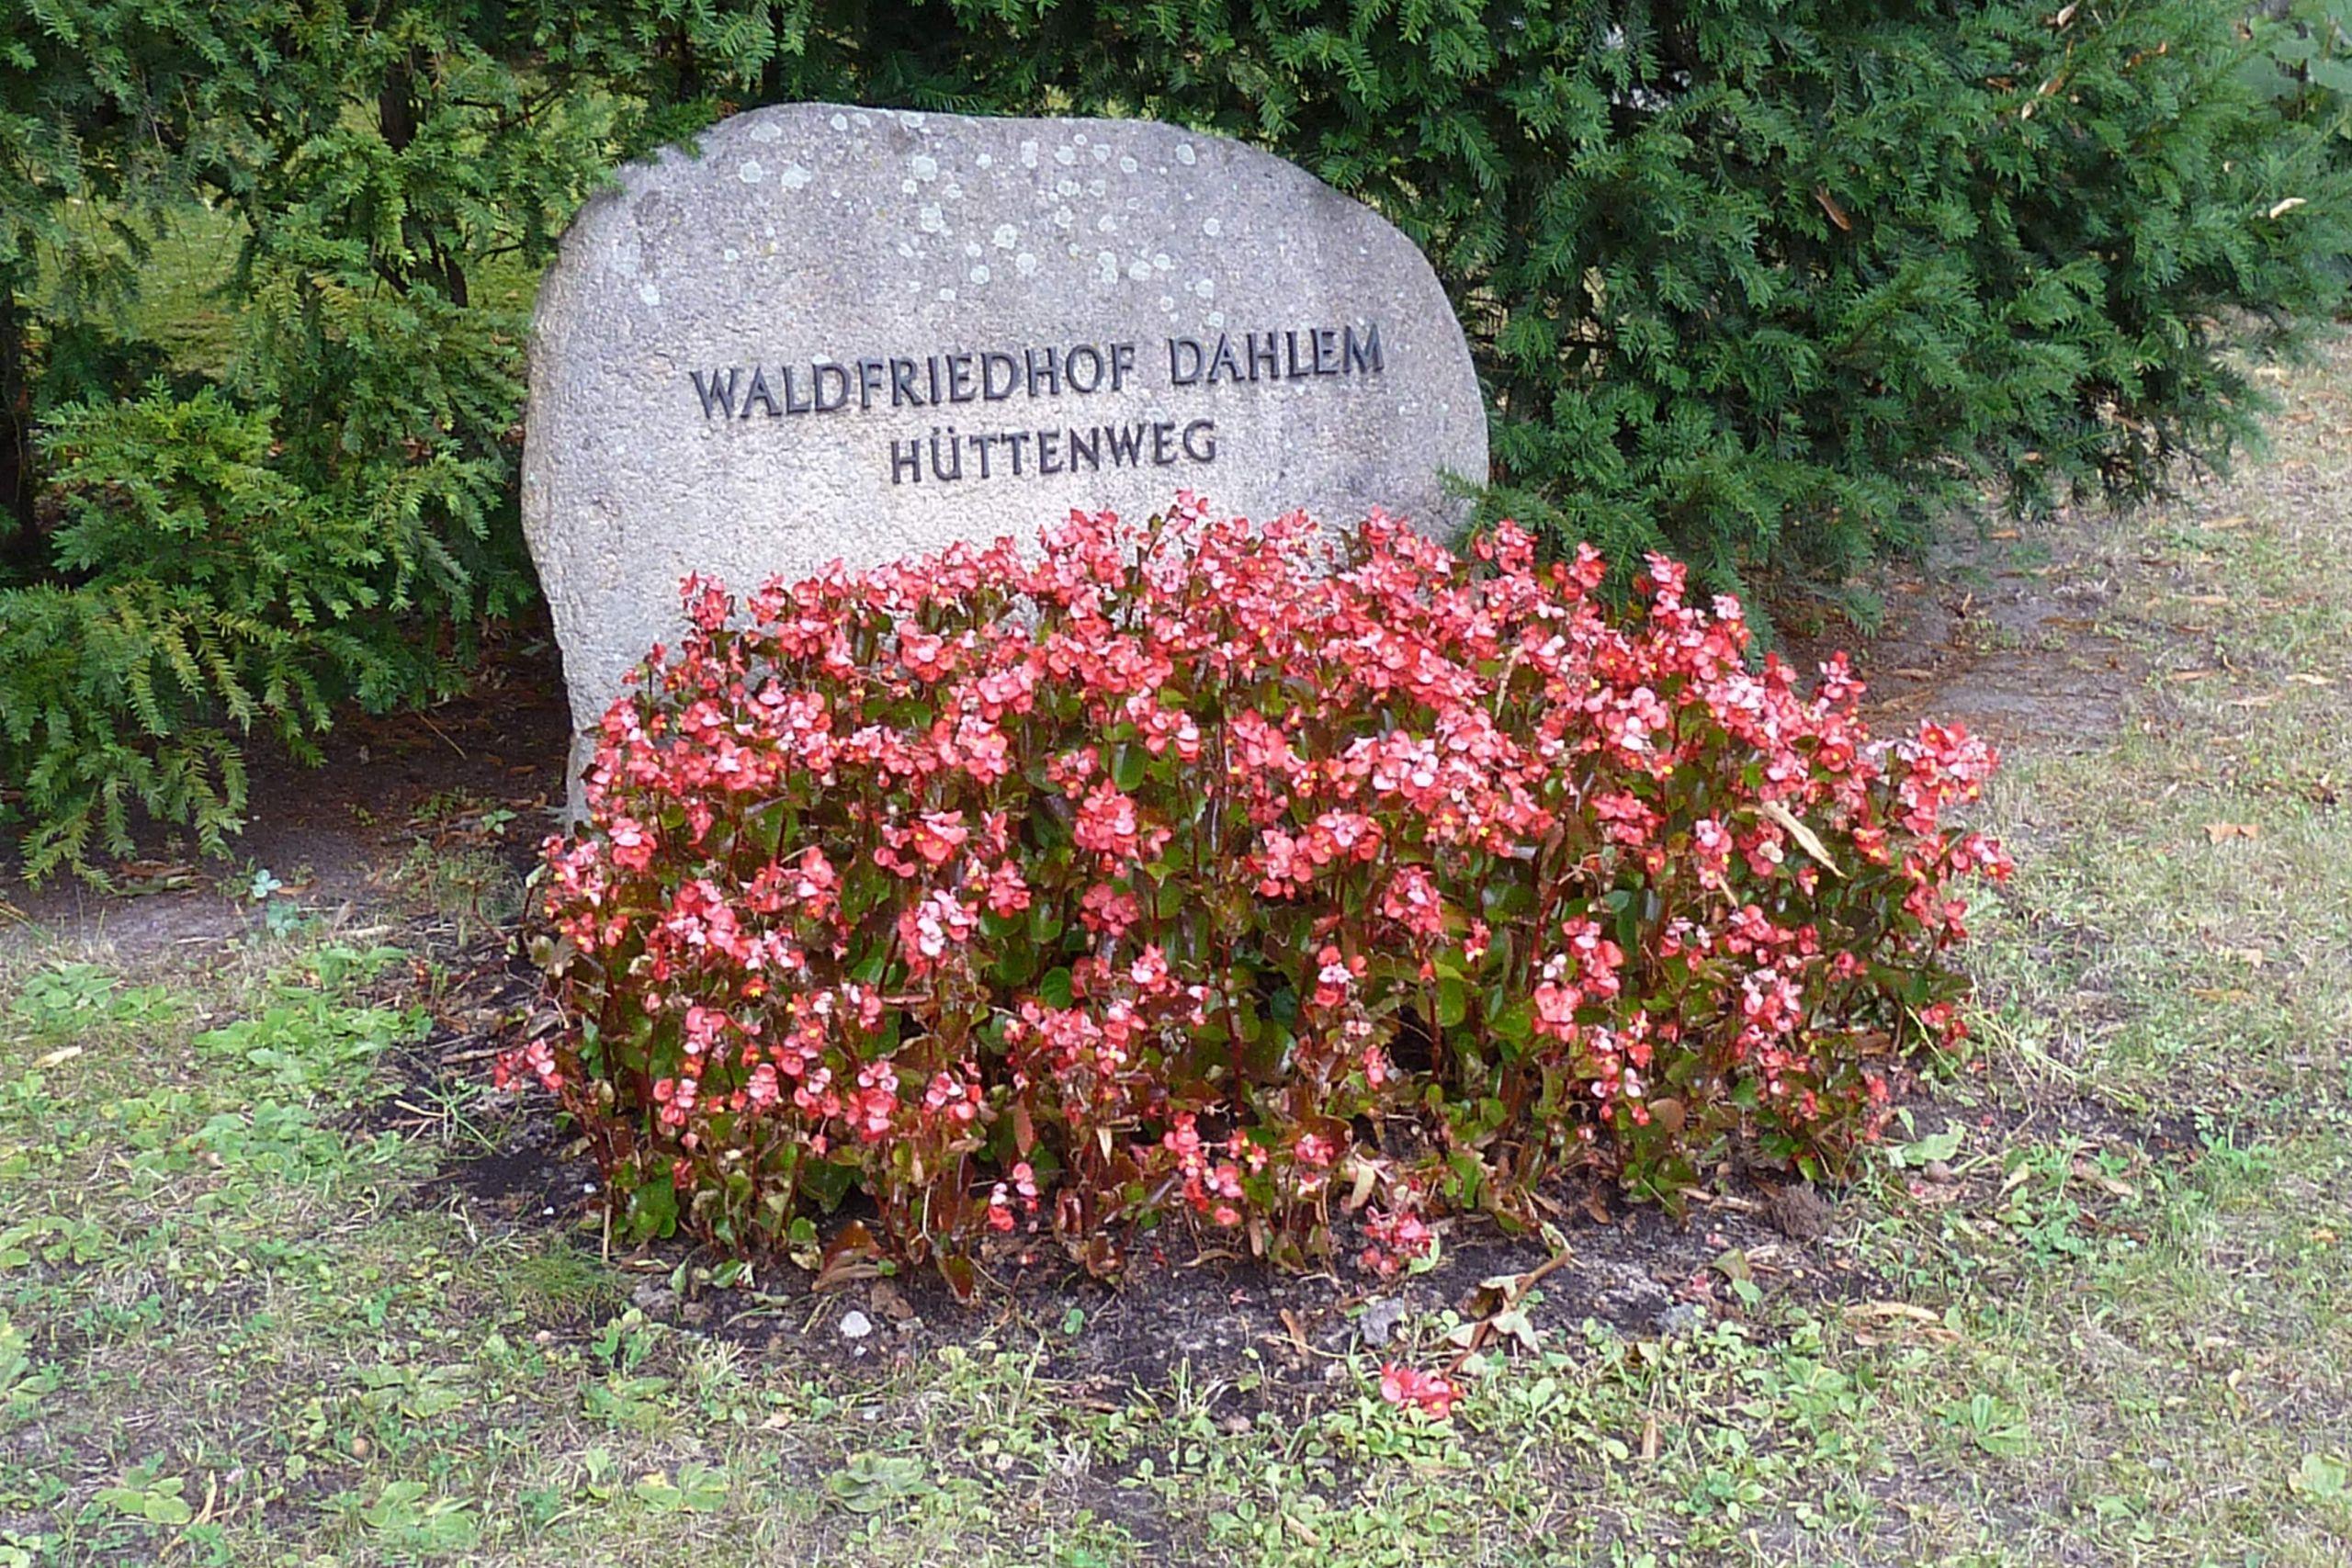 Waldfriedhof Dahlem Eingang